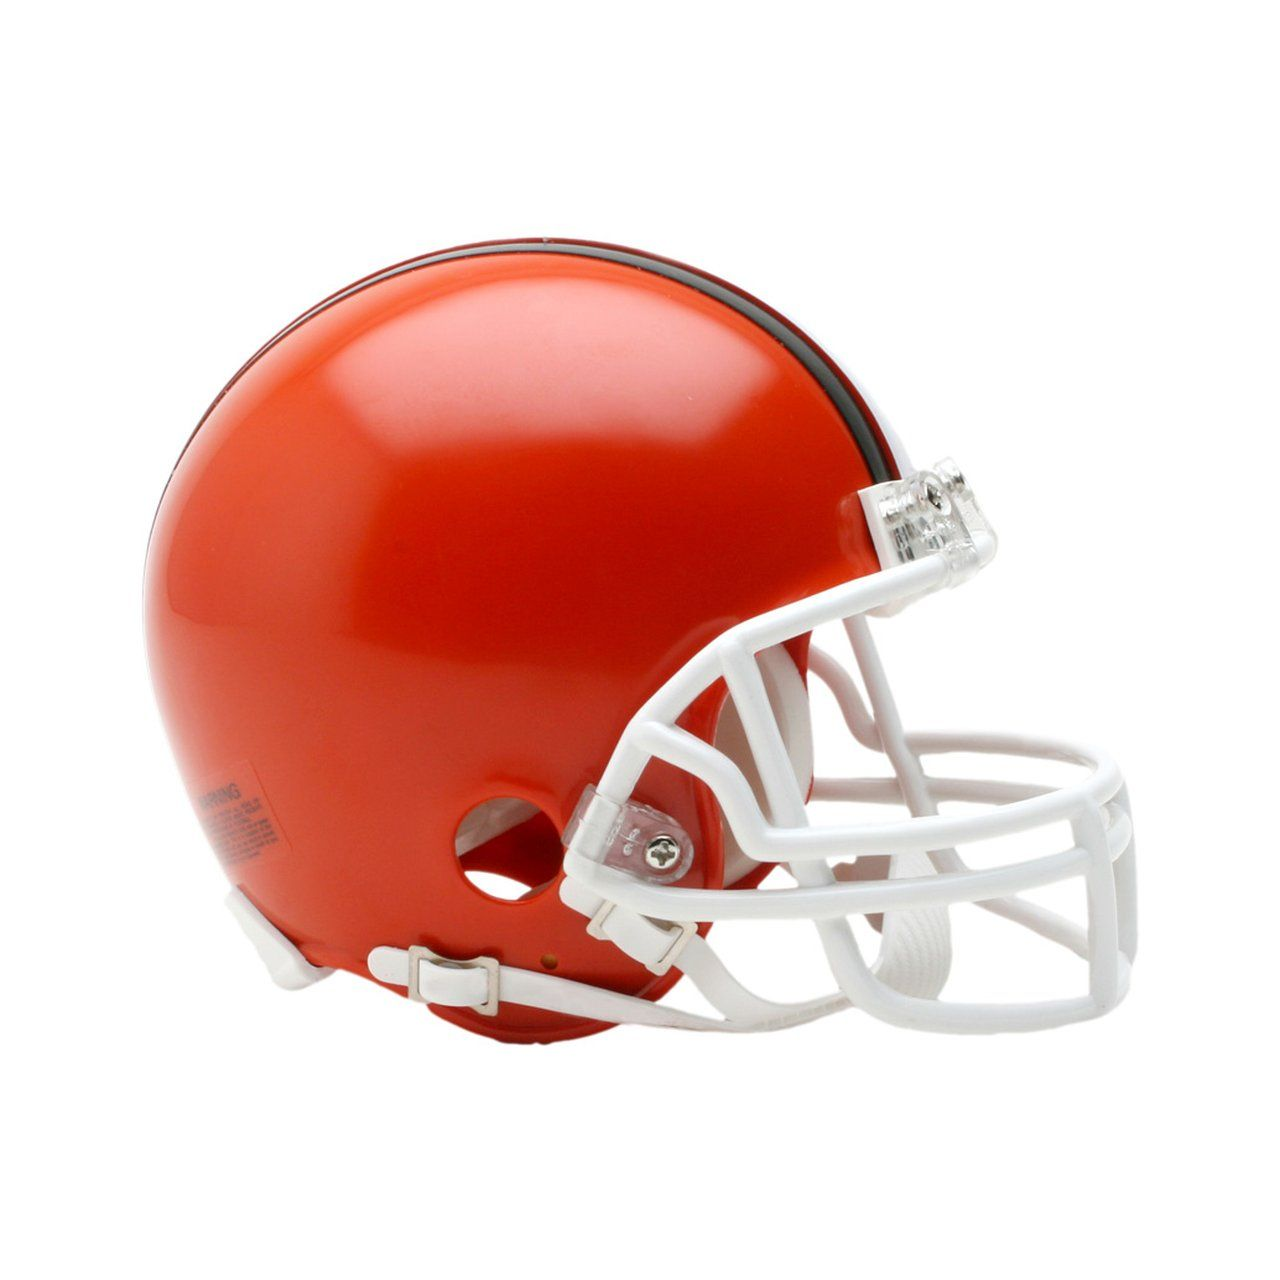 amfoo - Riddell VSR4 Mini Football Helm - Cleveland Browns 1975-2005